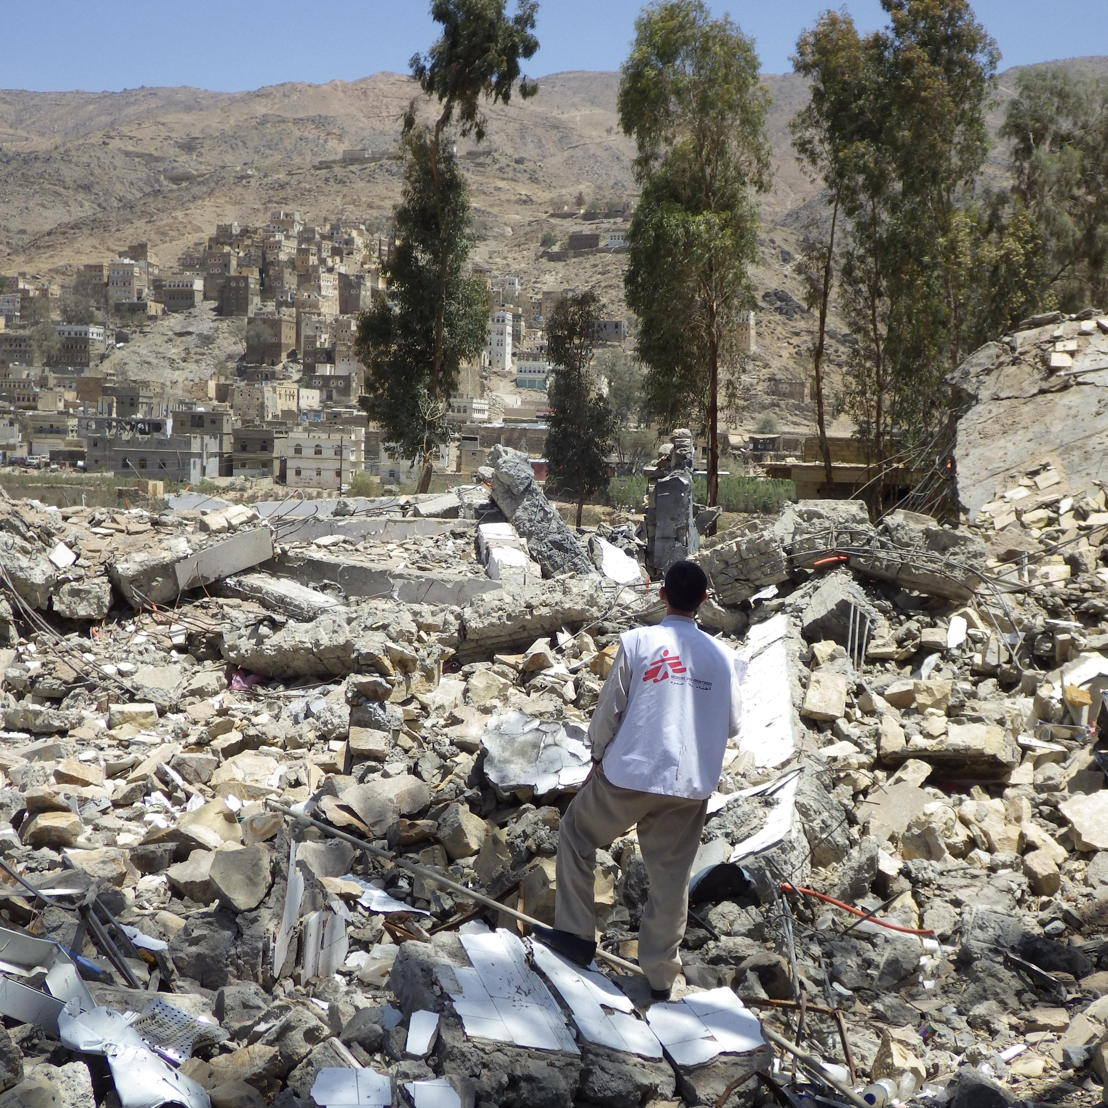 Haydan Hospital, March 2016, after 5 months of air strikes. Photographer: Atsuhiko Ochiai